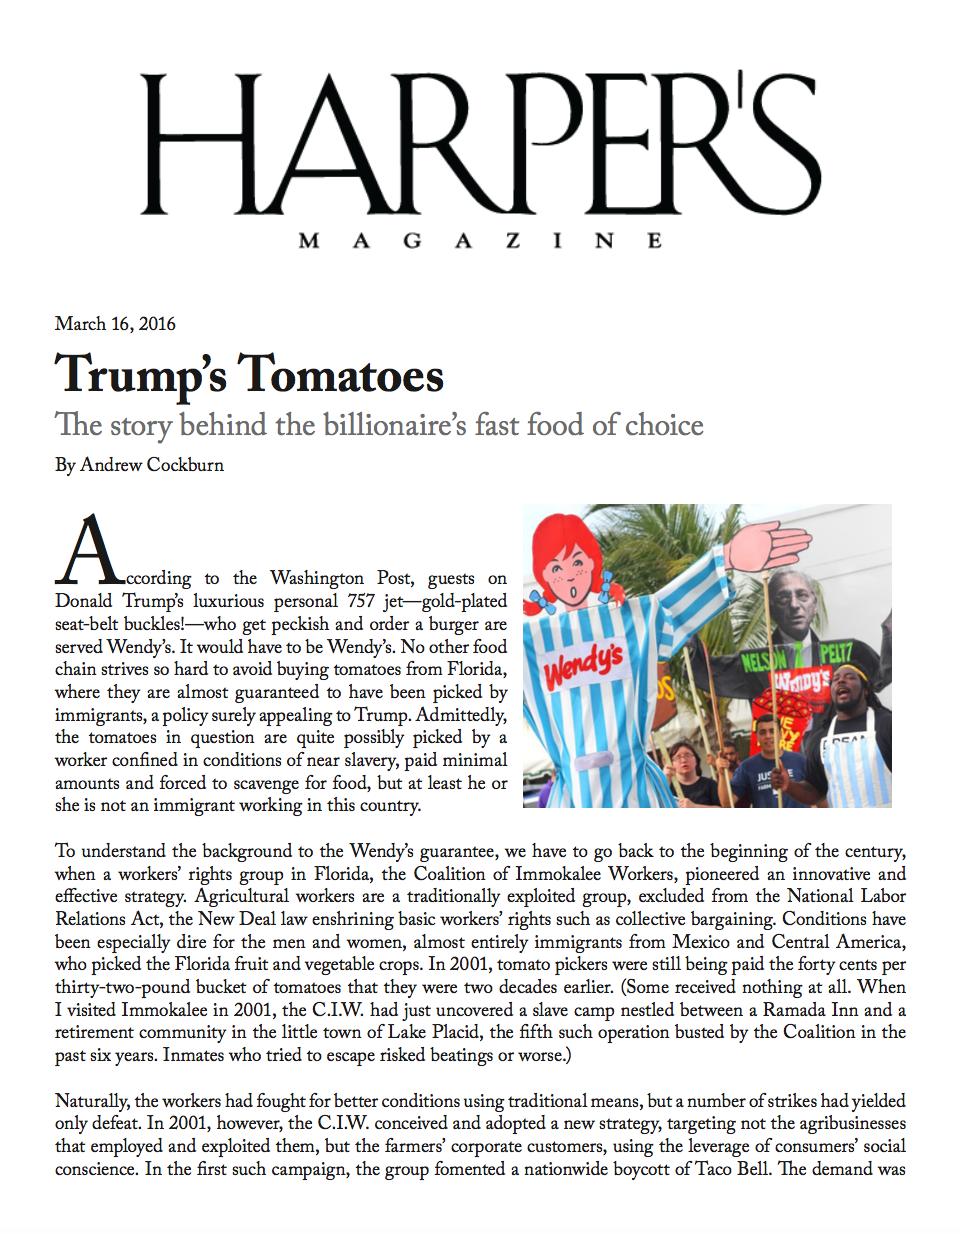 Harper's Magazine: Trump's Tomatoes